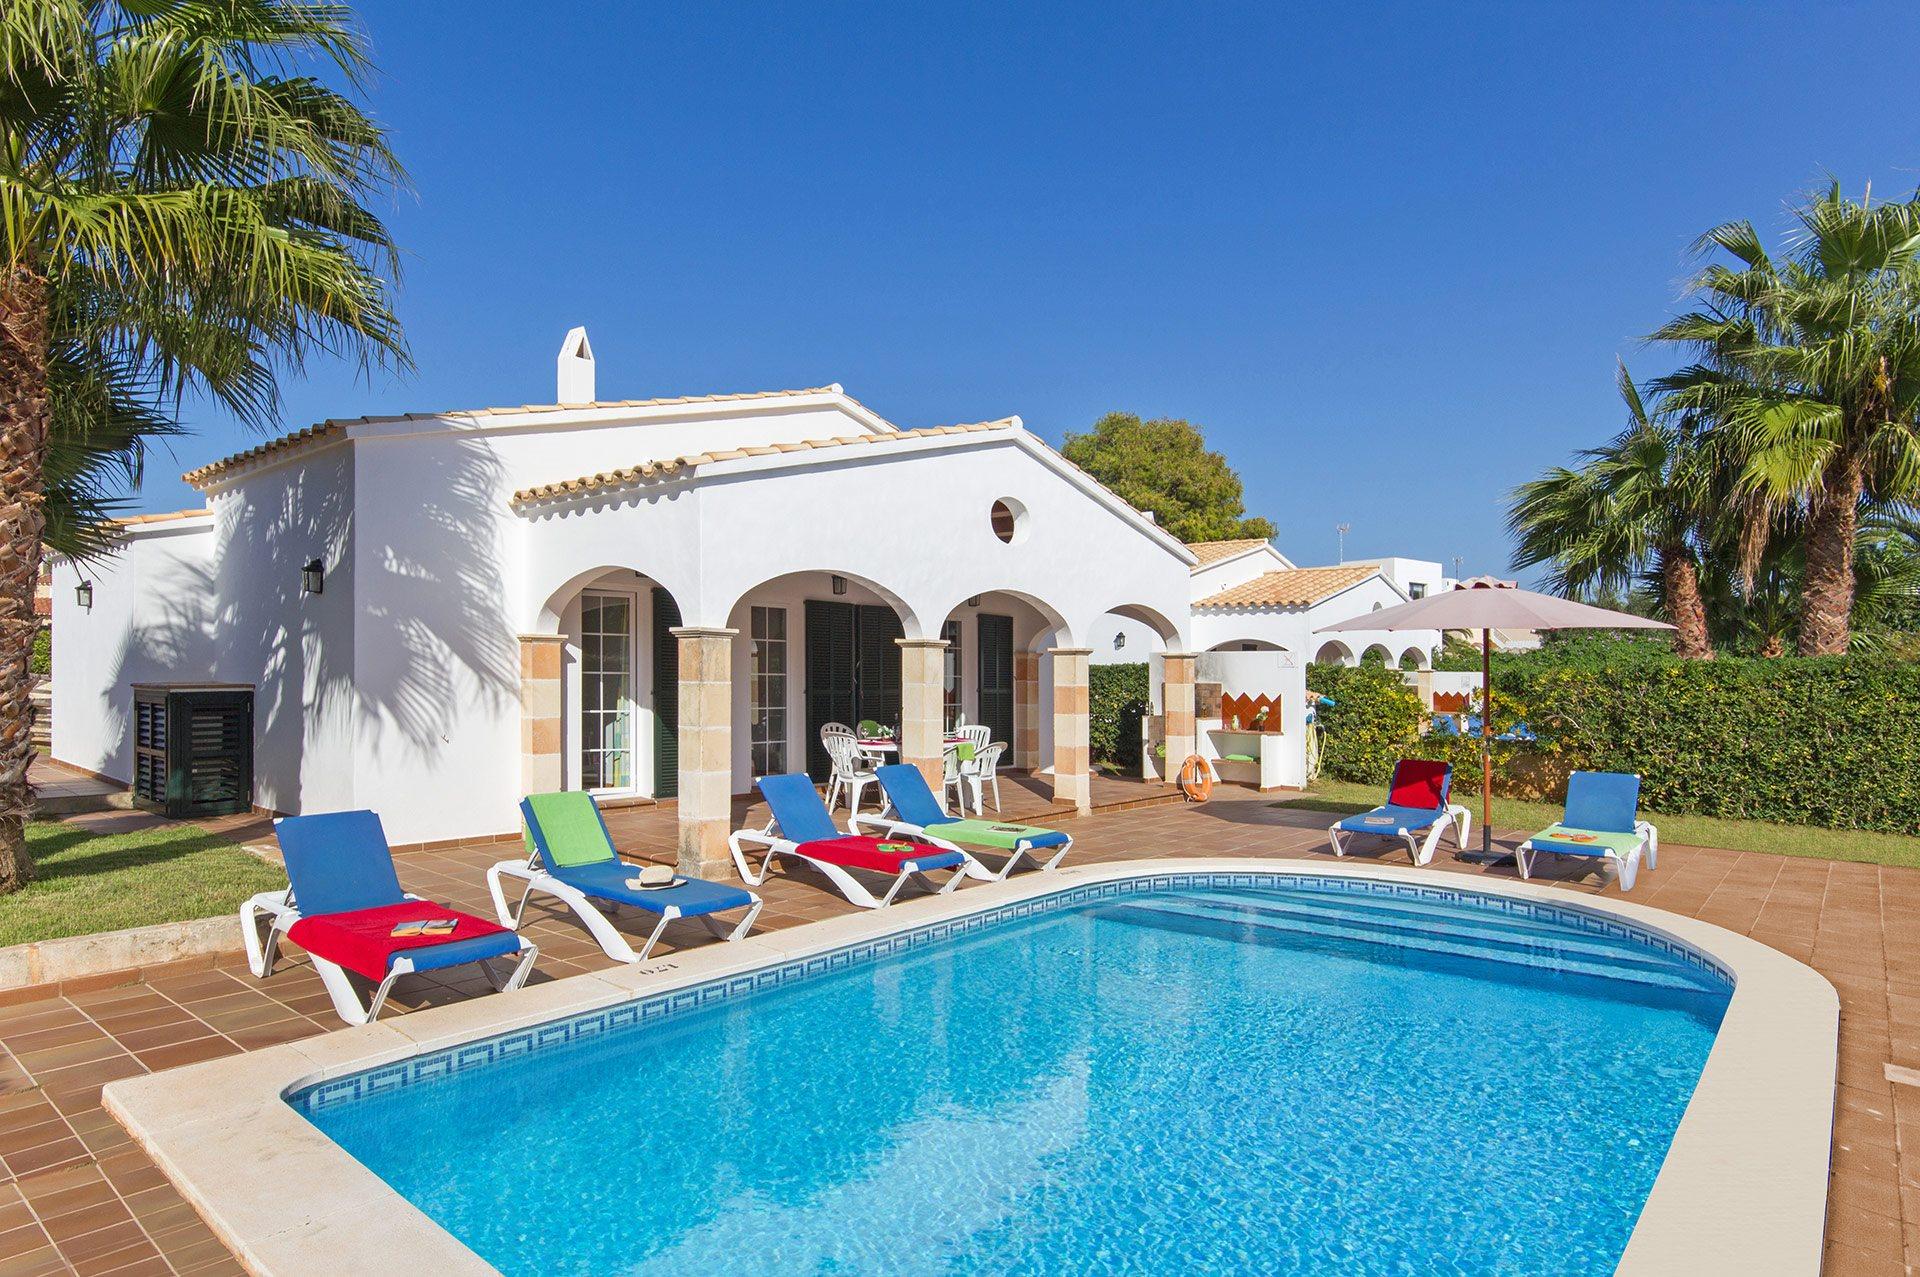 Villa Estornell, Calan Blanes, Menorca, Spain